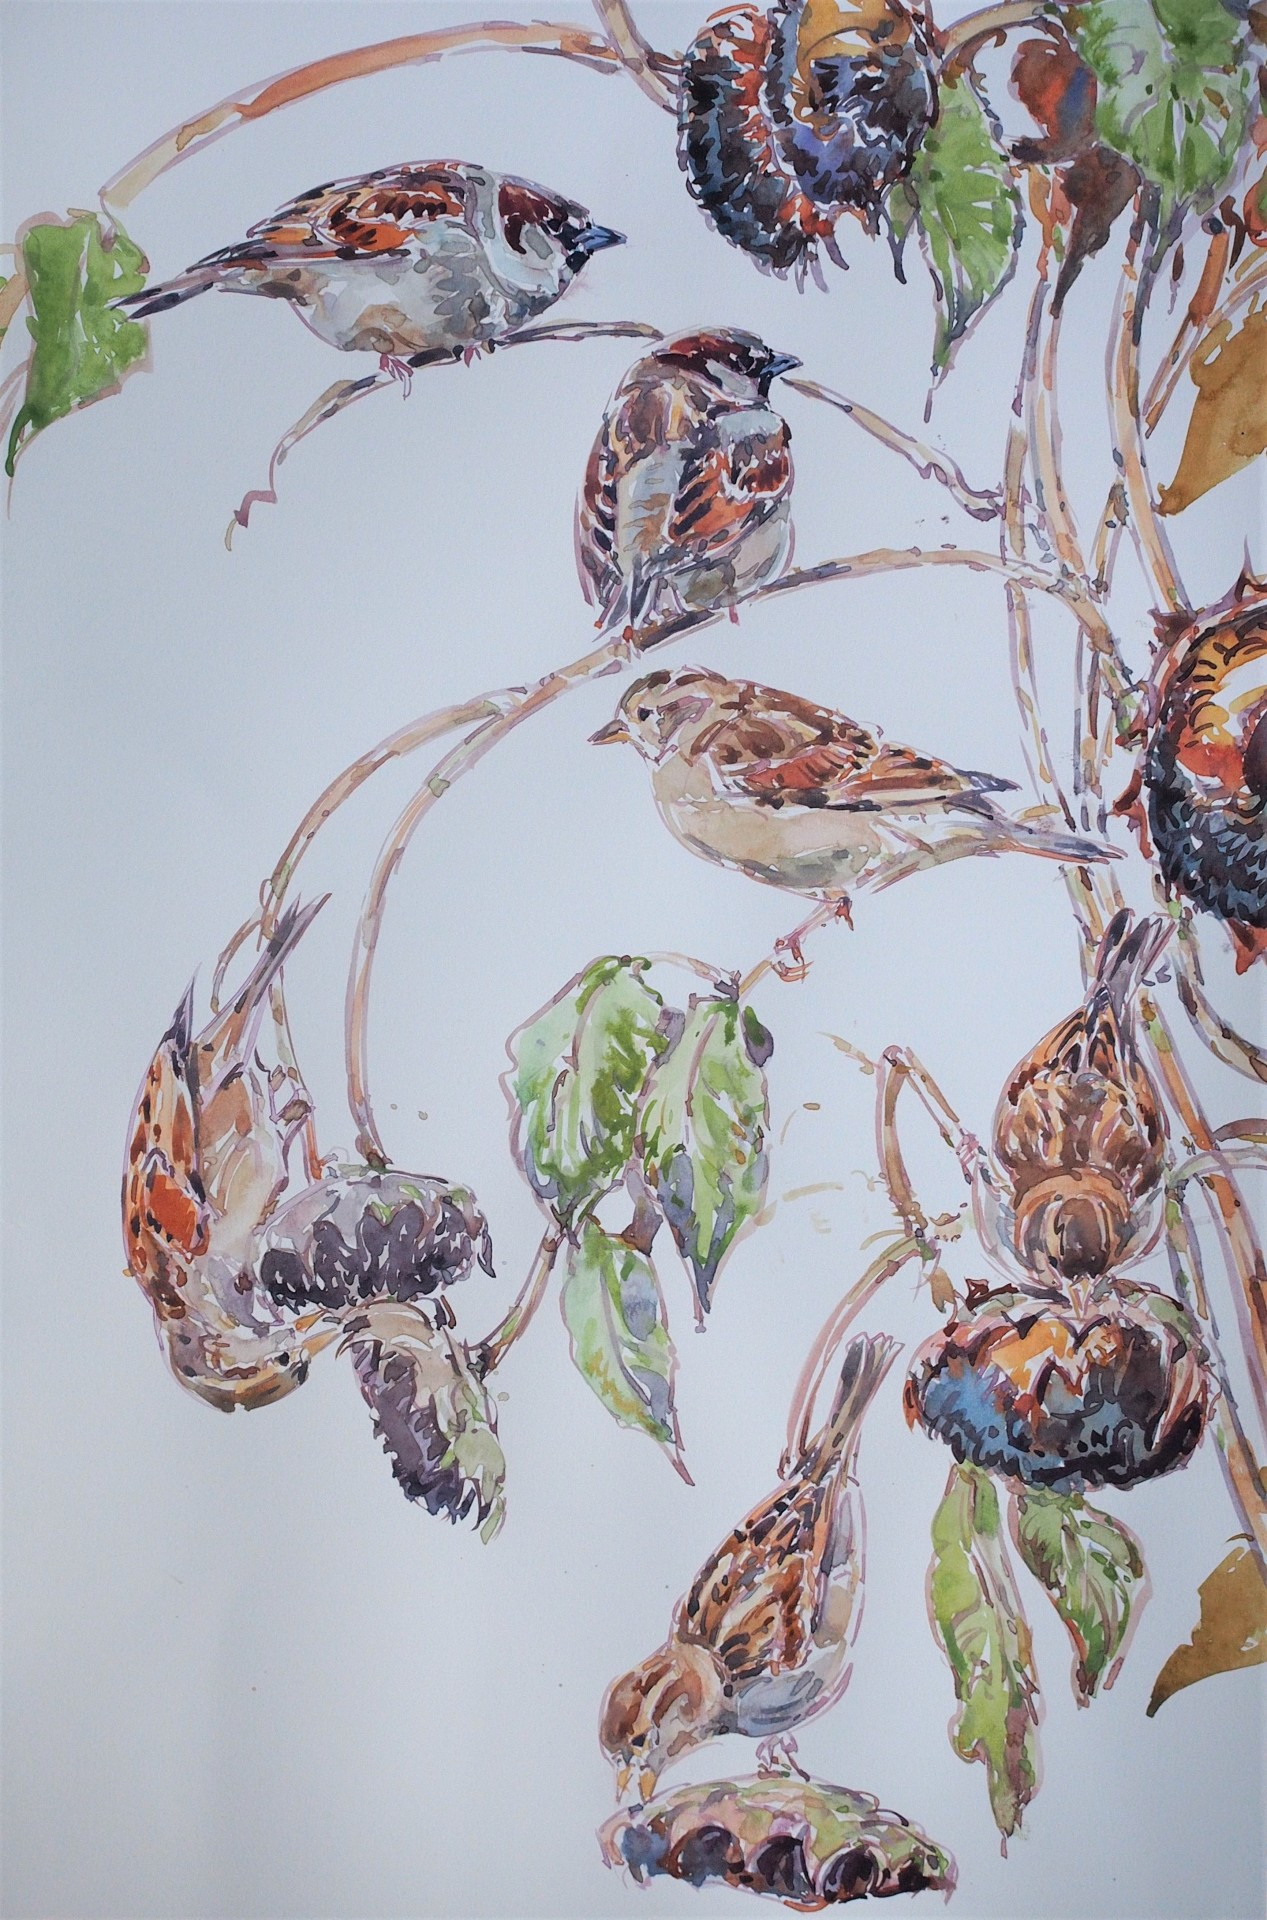 House Sparrows on Sunflower Heads